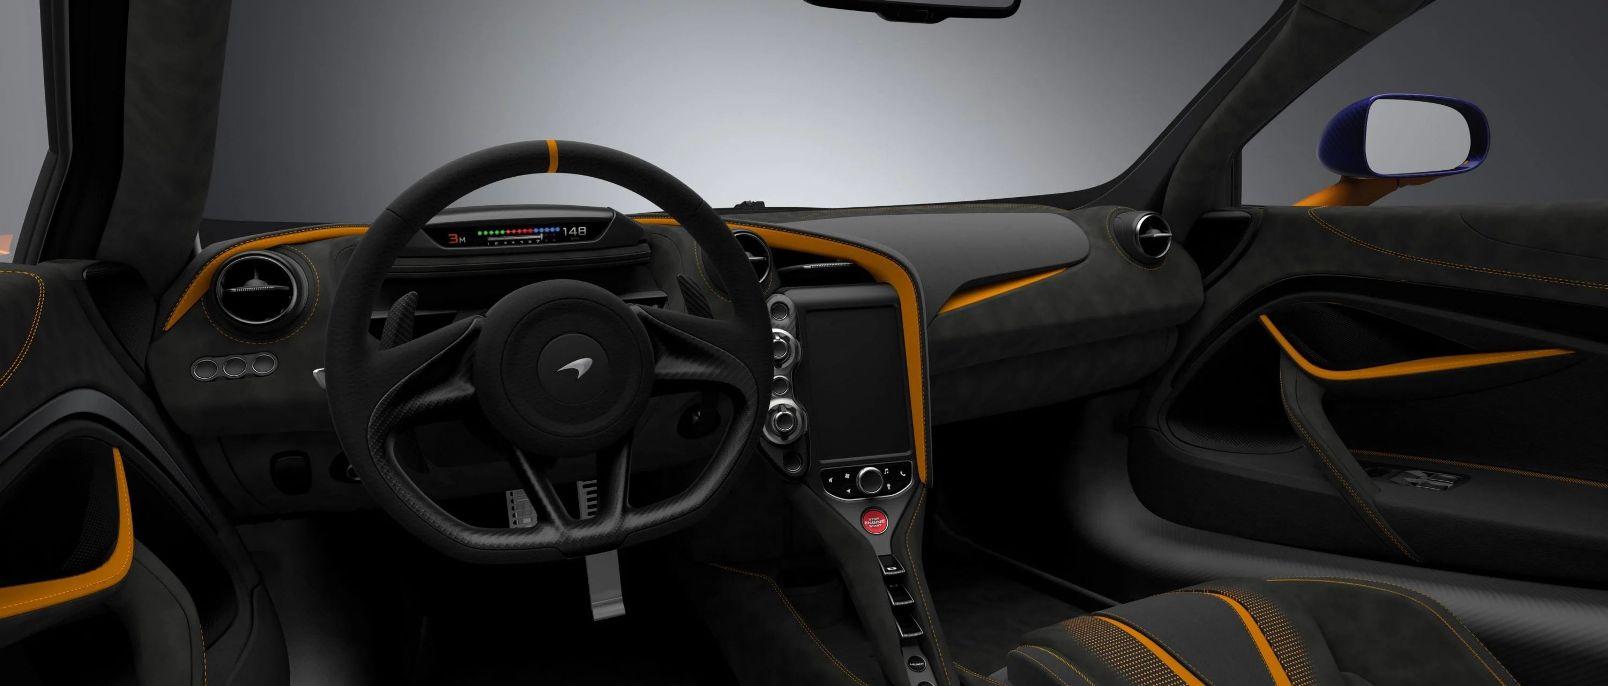 Mclaren 720s Daniel Ricciardo Edition (6)